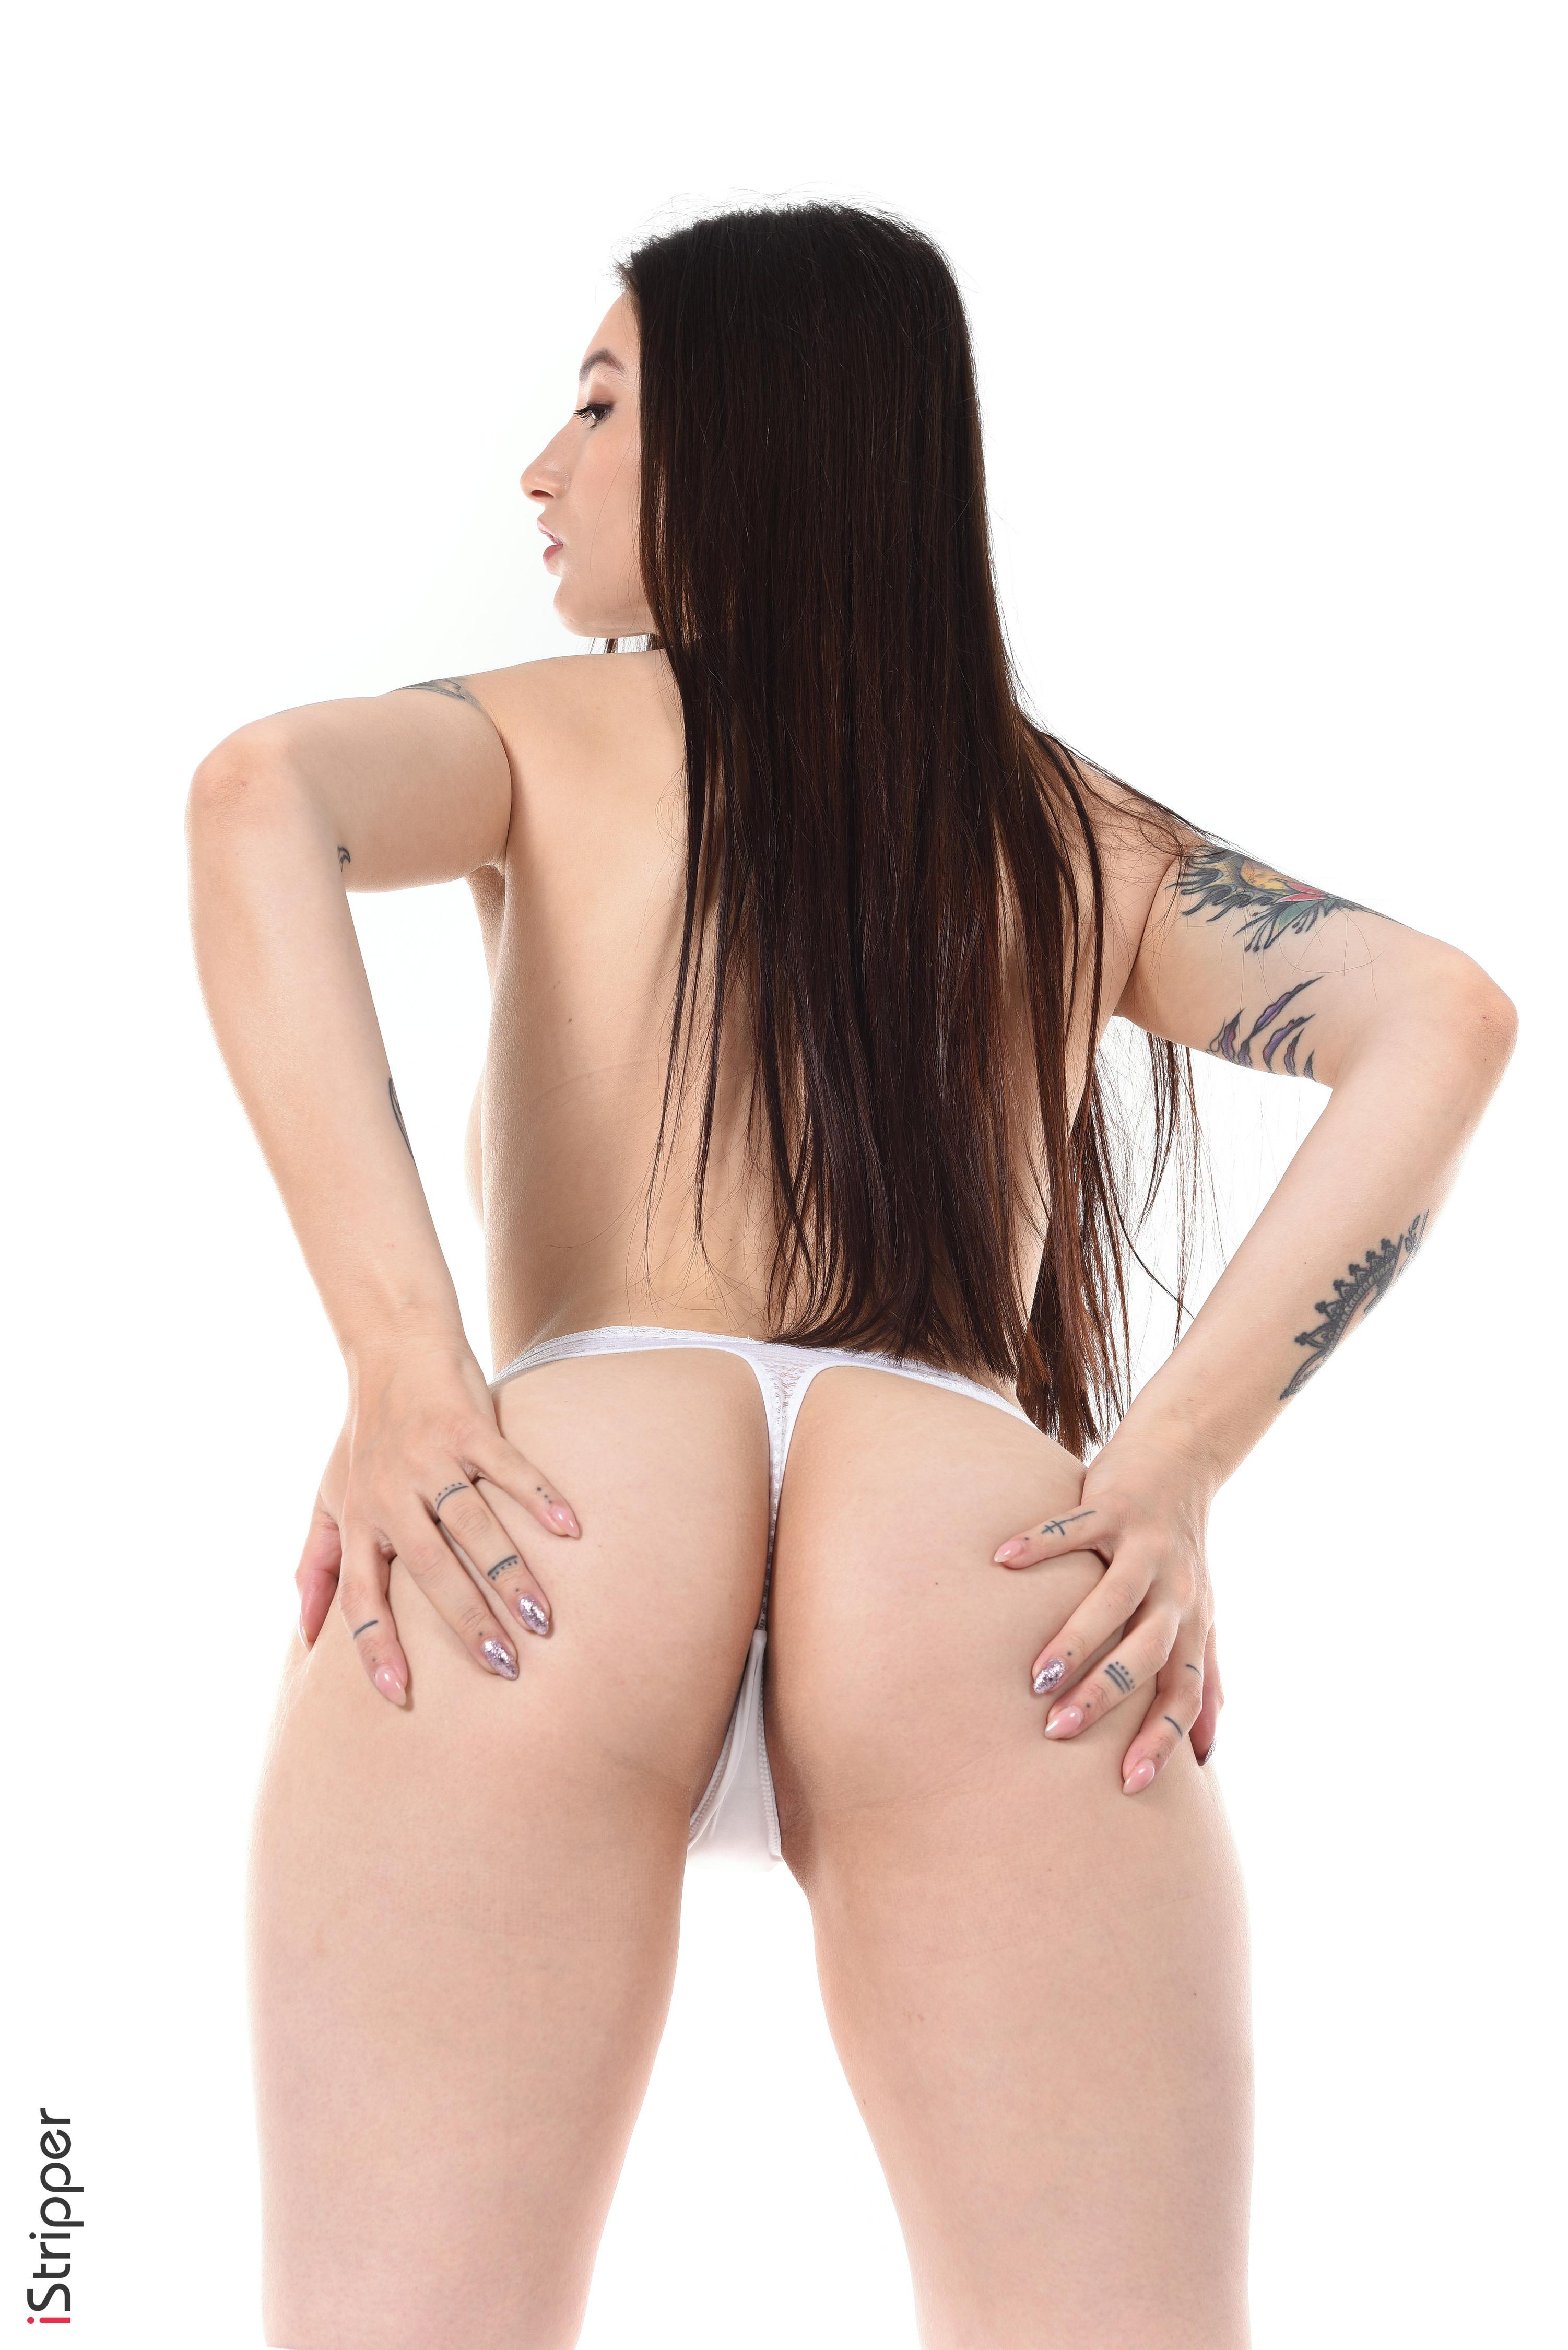 horny girl sexy striptease amateur